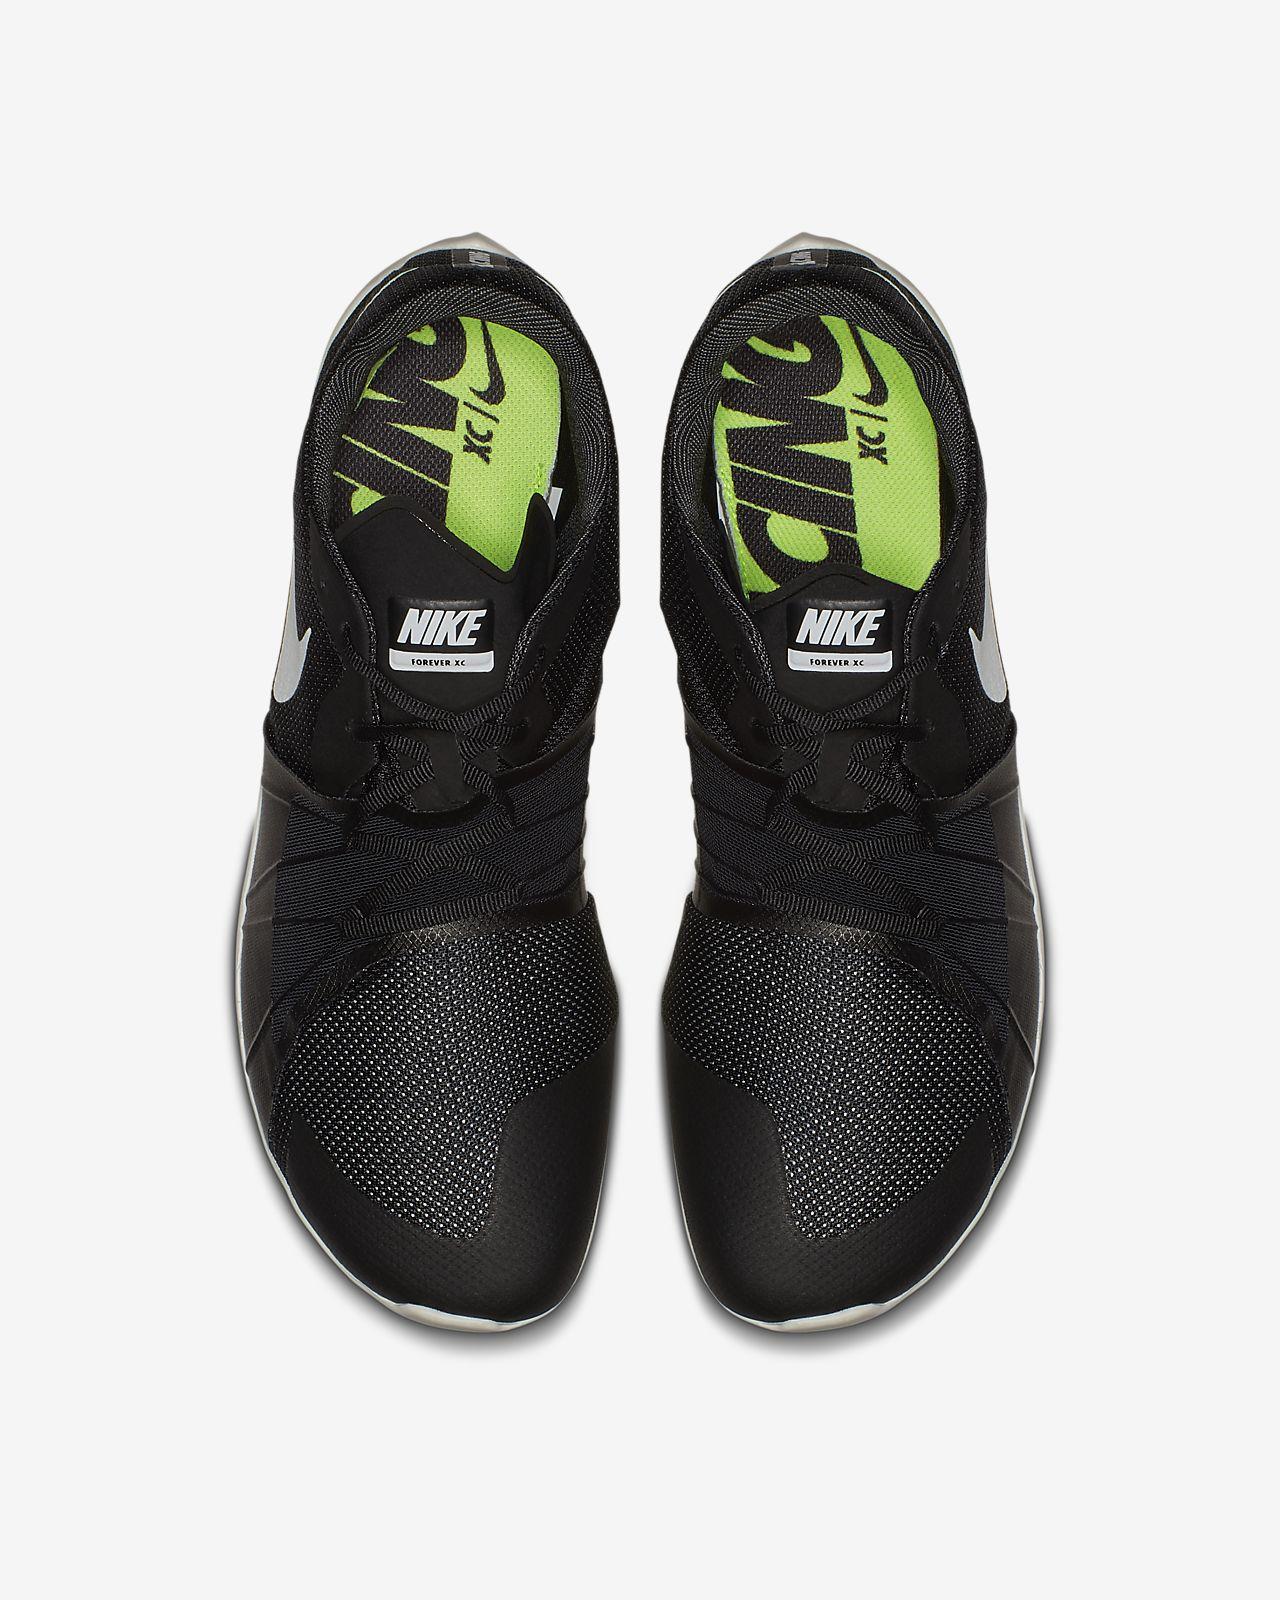 hot sale online 354b9 bec2b ... Nike Zoom Forever XC 5 Unisex Track Spike